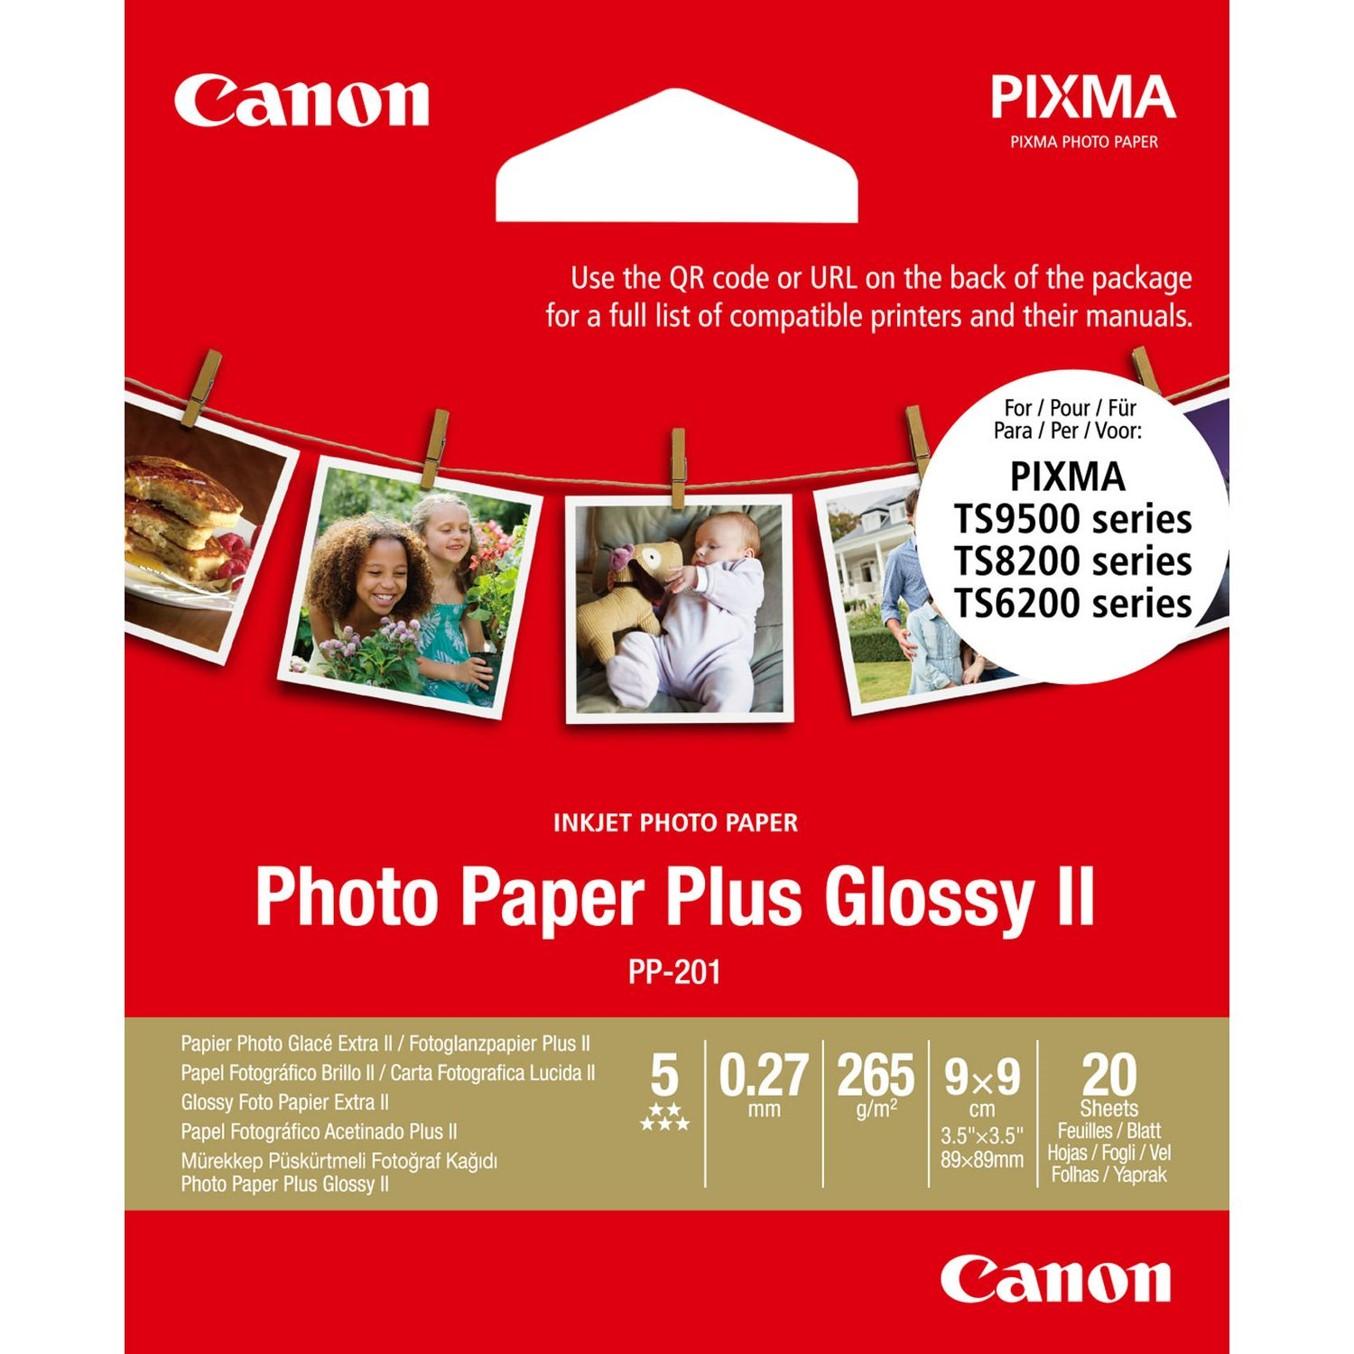 Canon Photo Paper Plus Glossy II PP-201 - papel fotográfico brillante - 20 hoja(s) - 89 x 89 mm - 265 g/m²